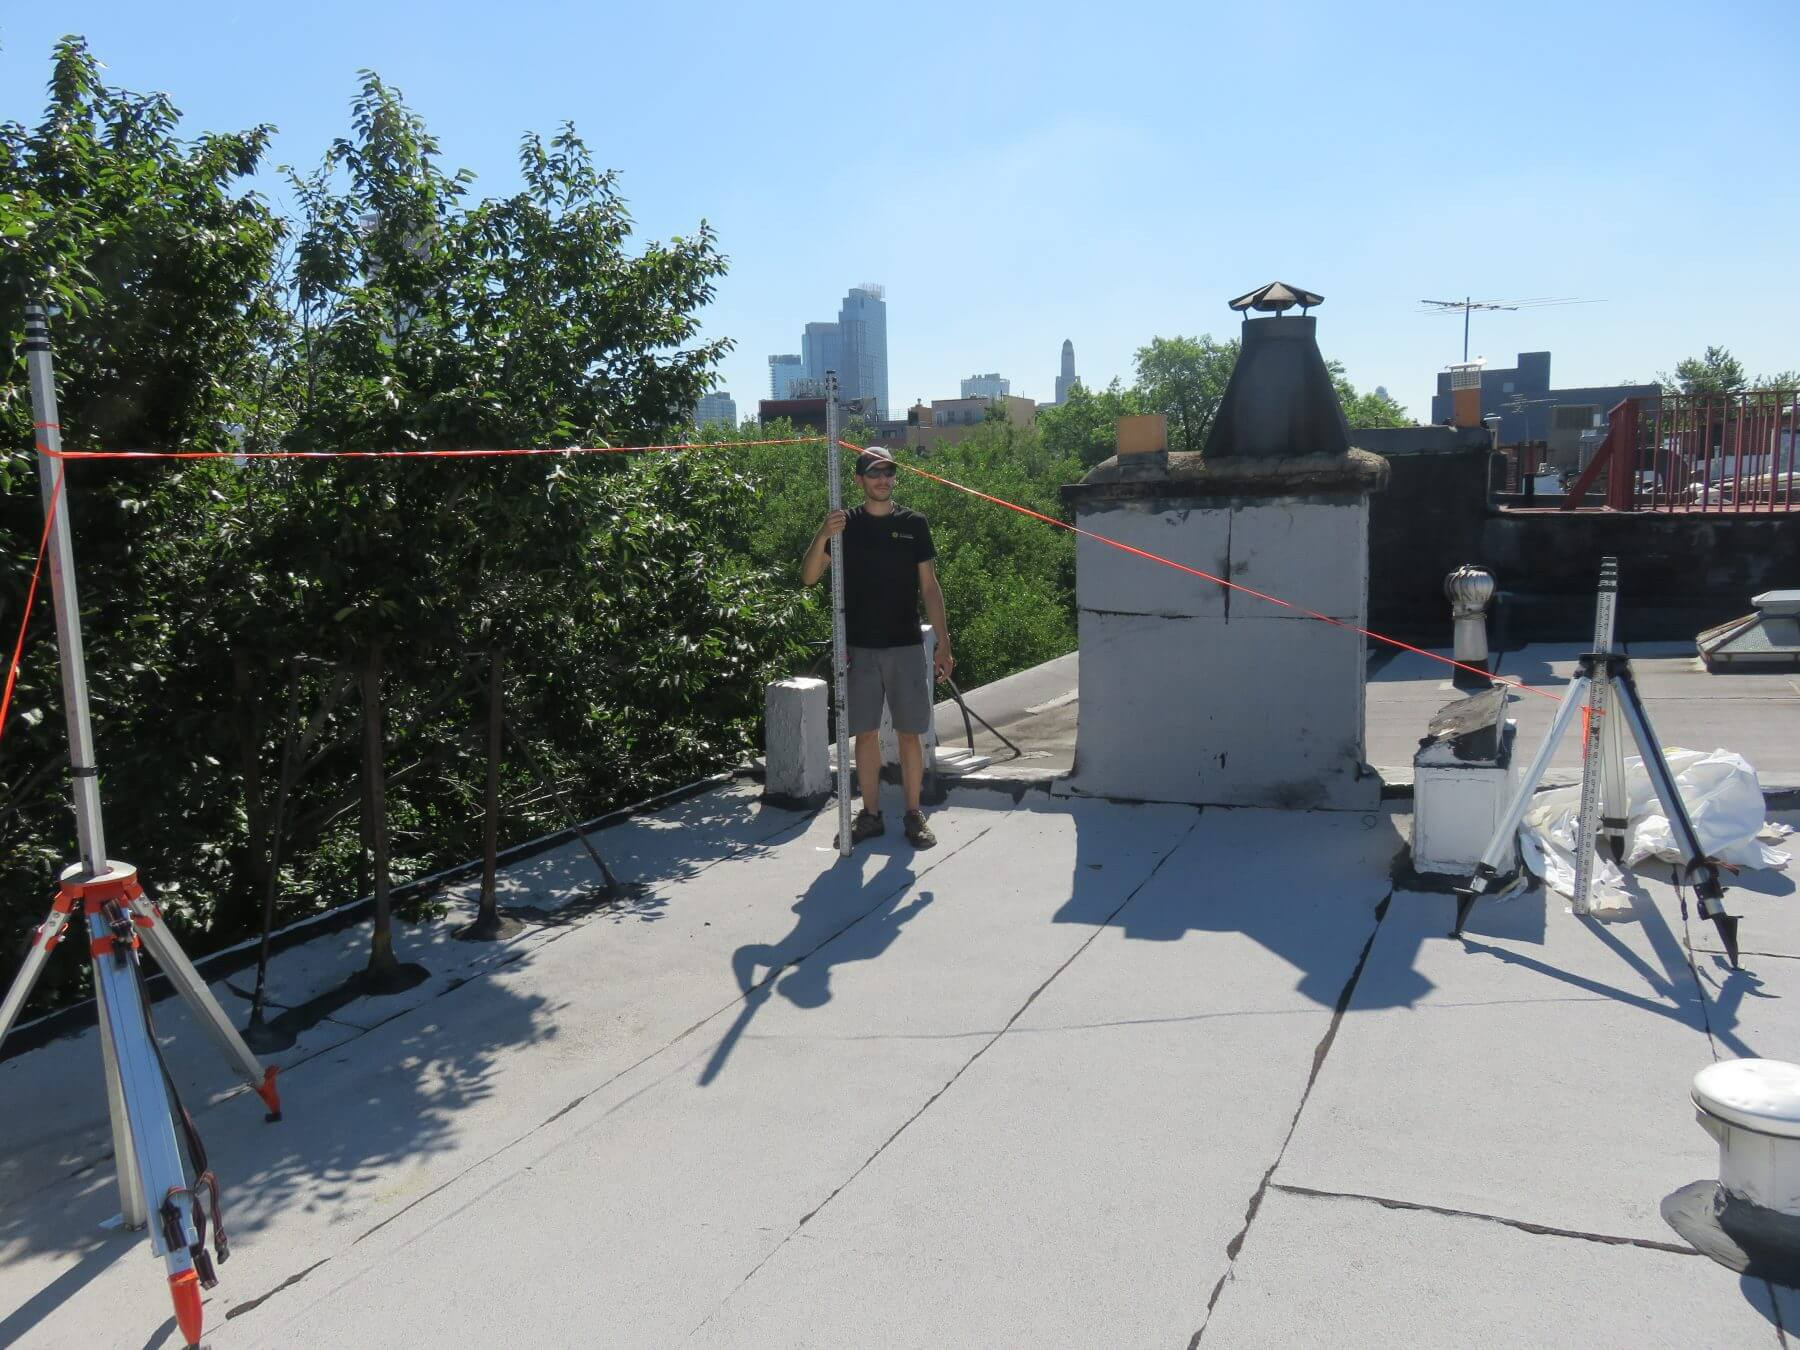 A BSW surveyor conducting a landmarks visibilty test